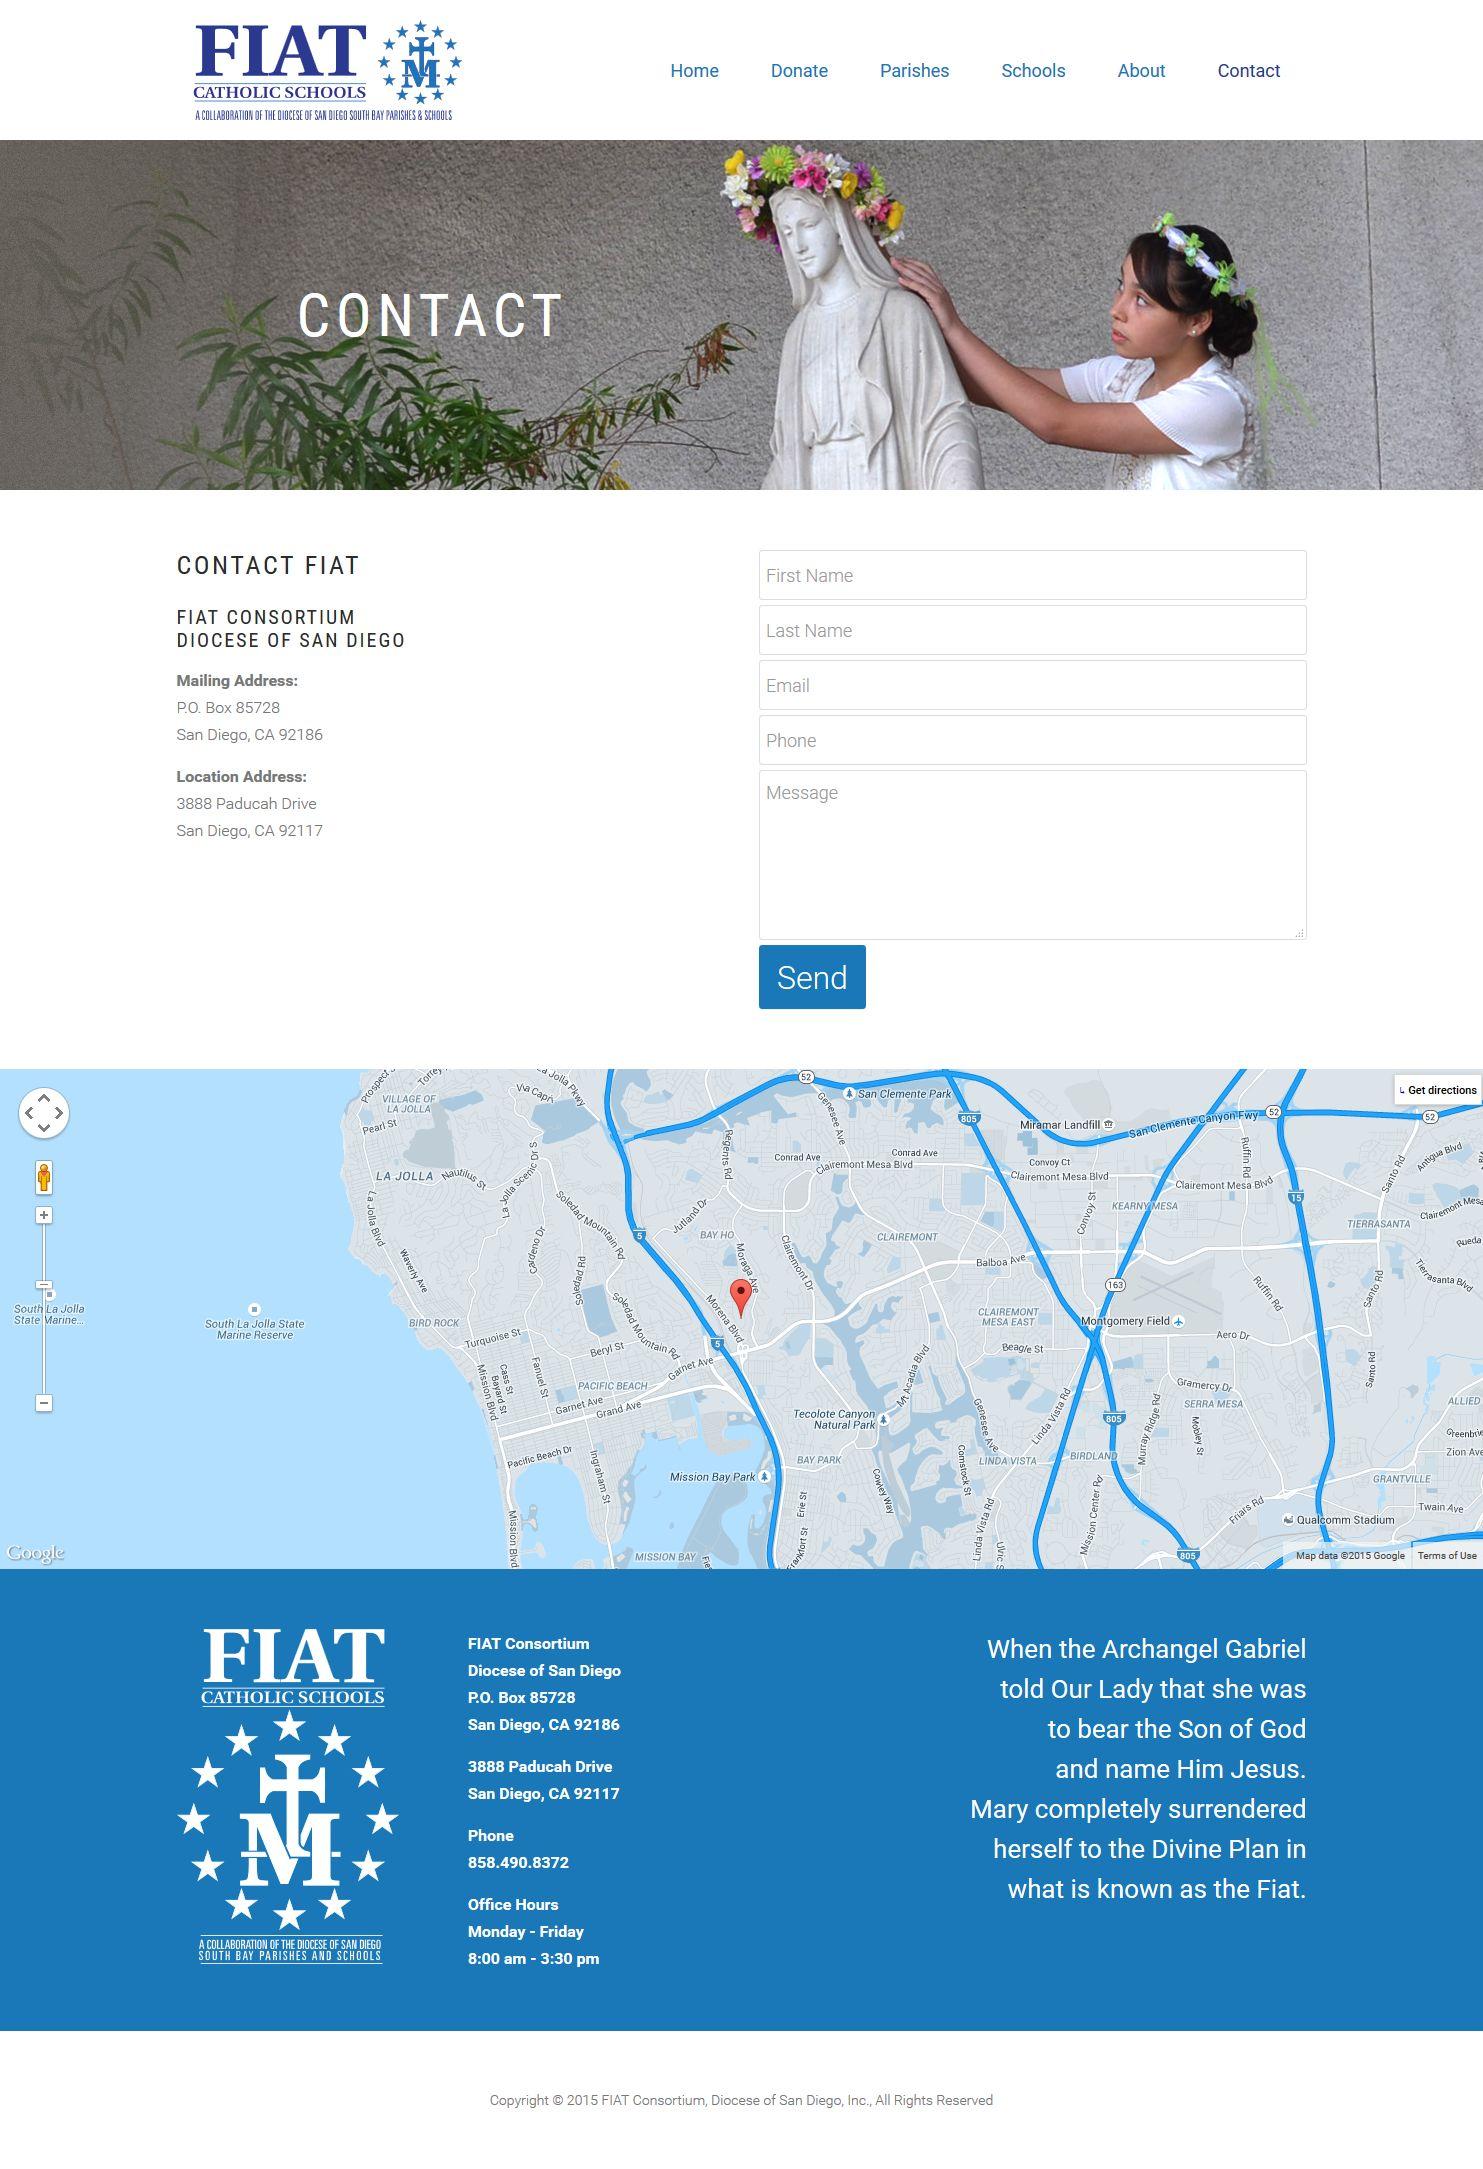 -fiat-catholic-schools-contact-page